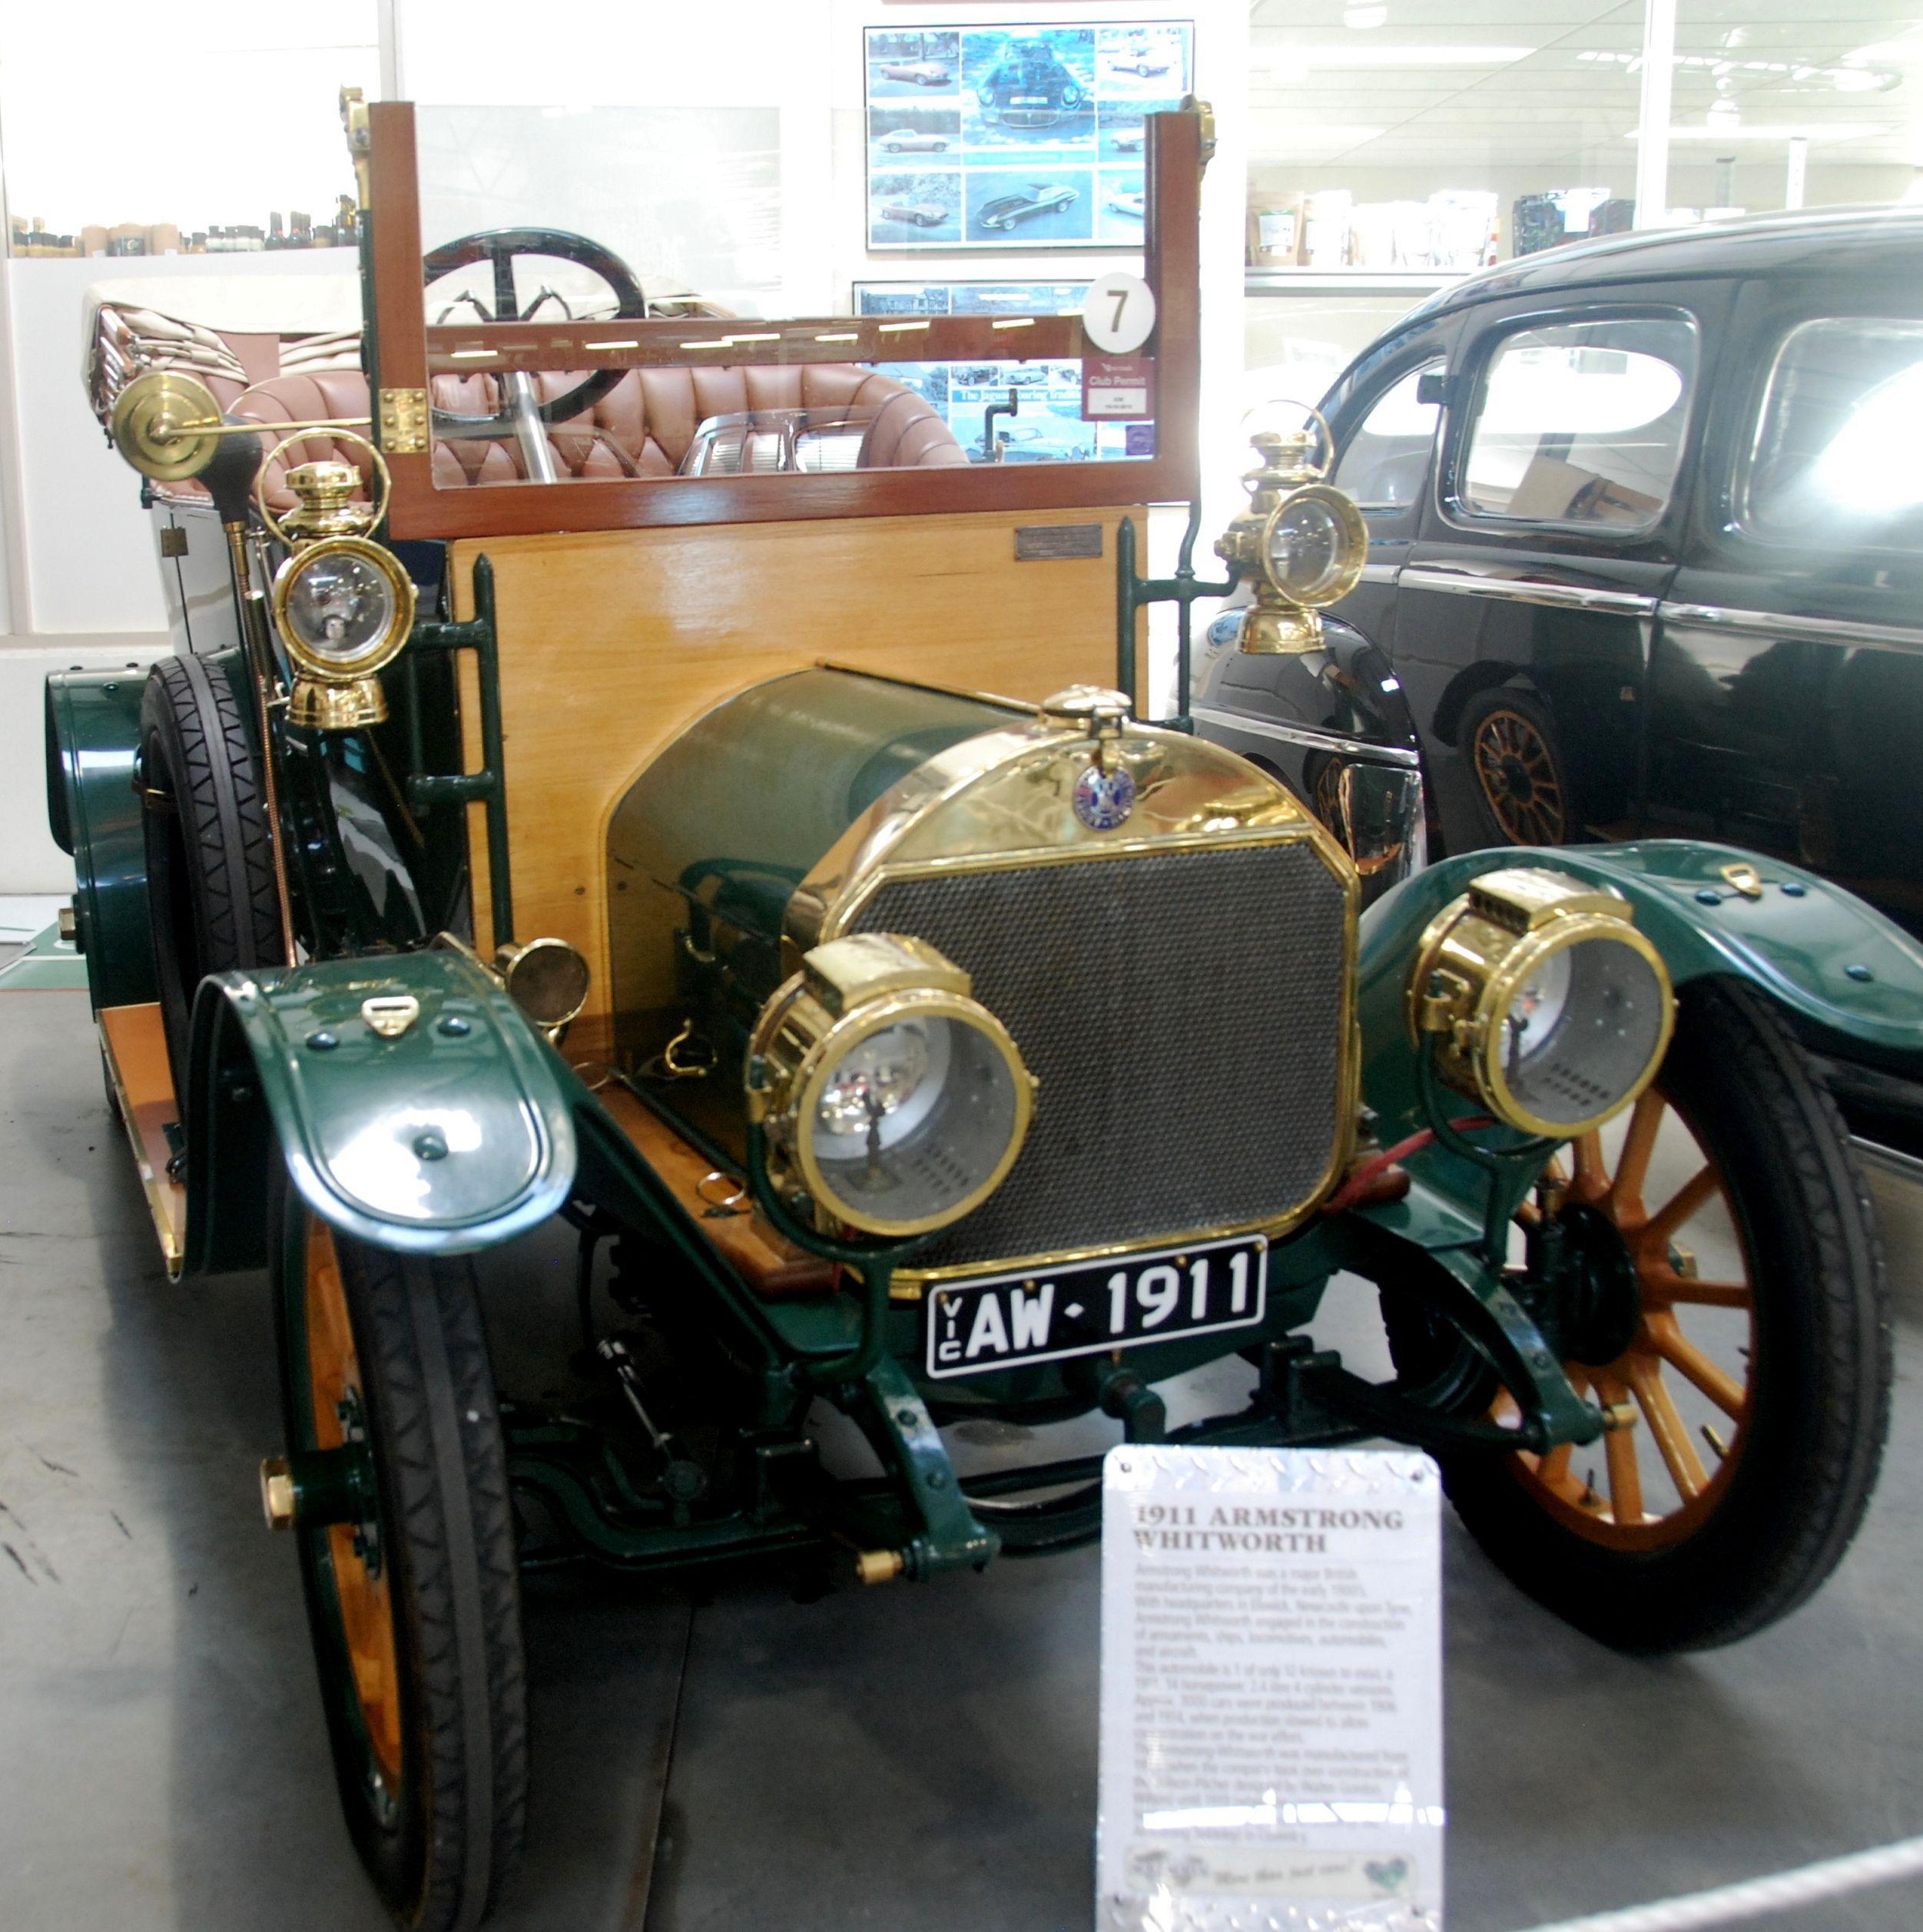 1911 Armstrong Whitworth Shepparton Car Museum